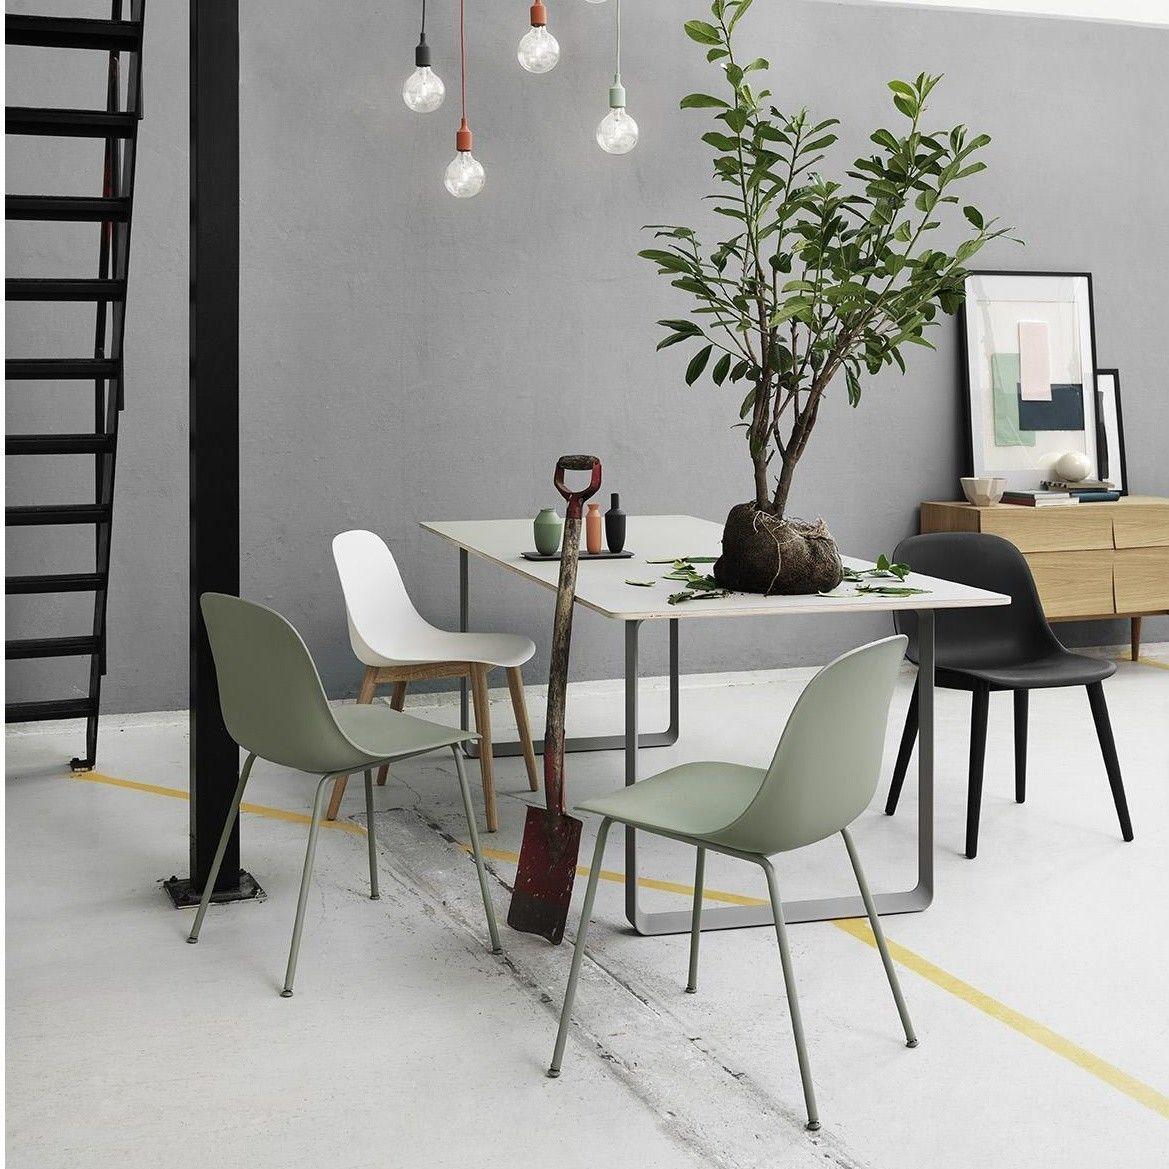 muuto 70 70 tisch muuto. Black Bedroom Furniture Sets. Home Design Ideas